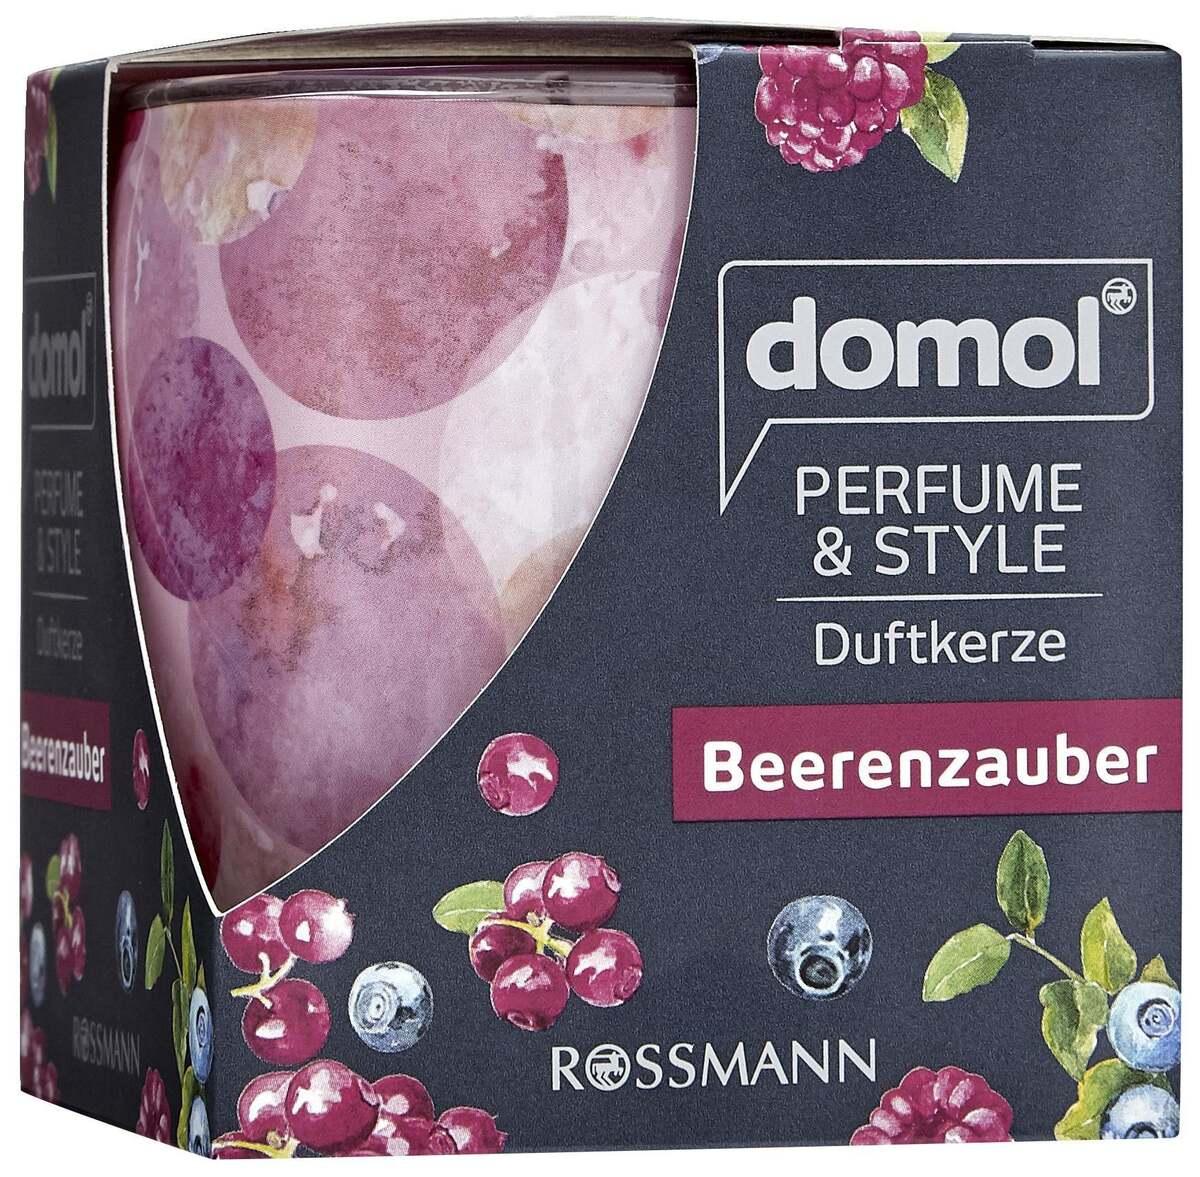 "Bild 1 von domol              Duftkerze Perfume & Style ""Beerenzauber"""